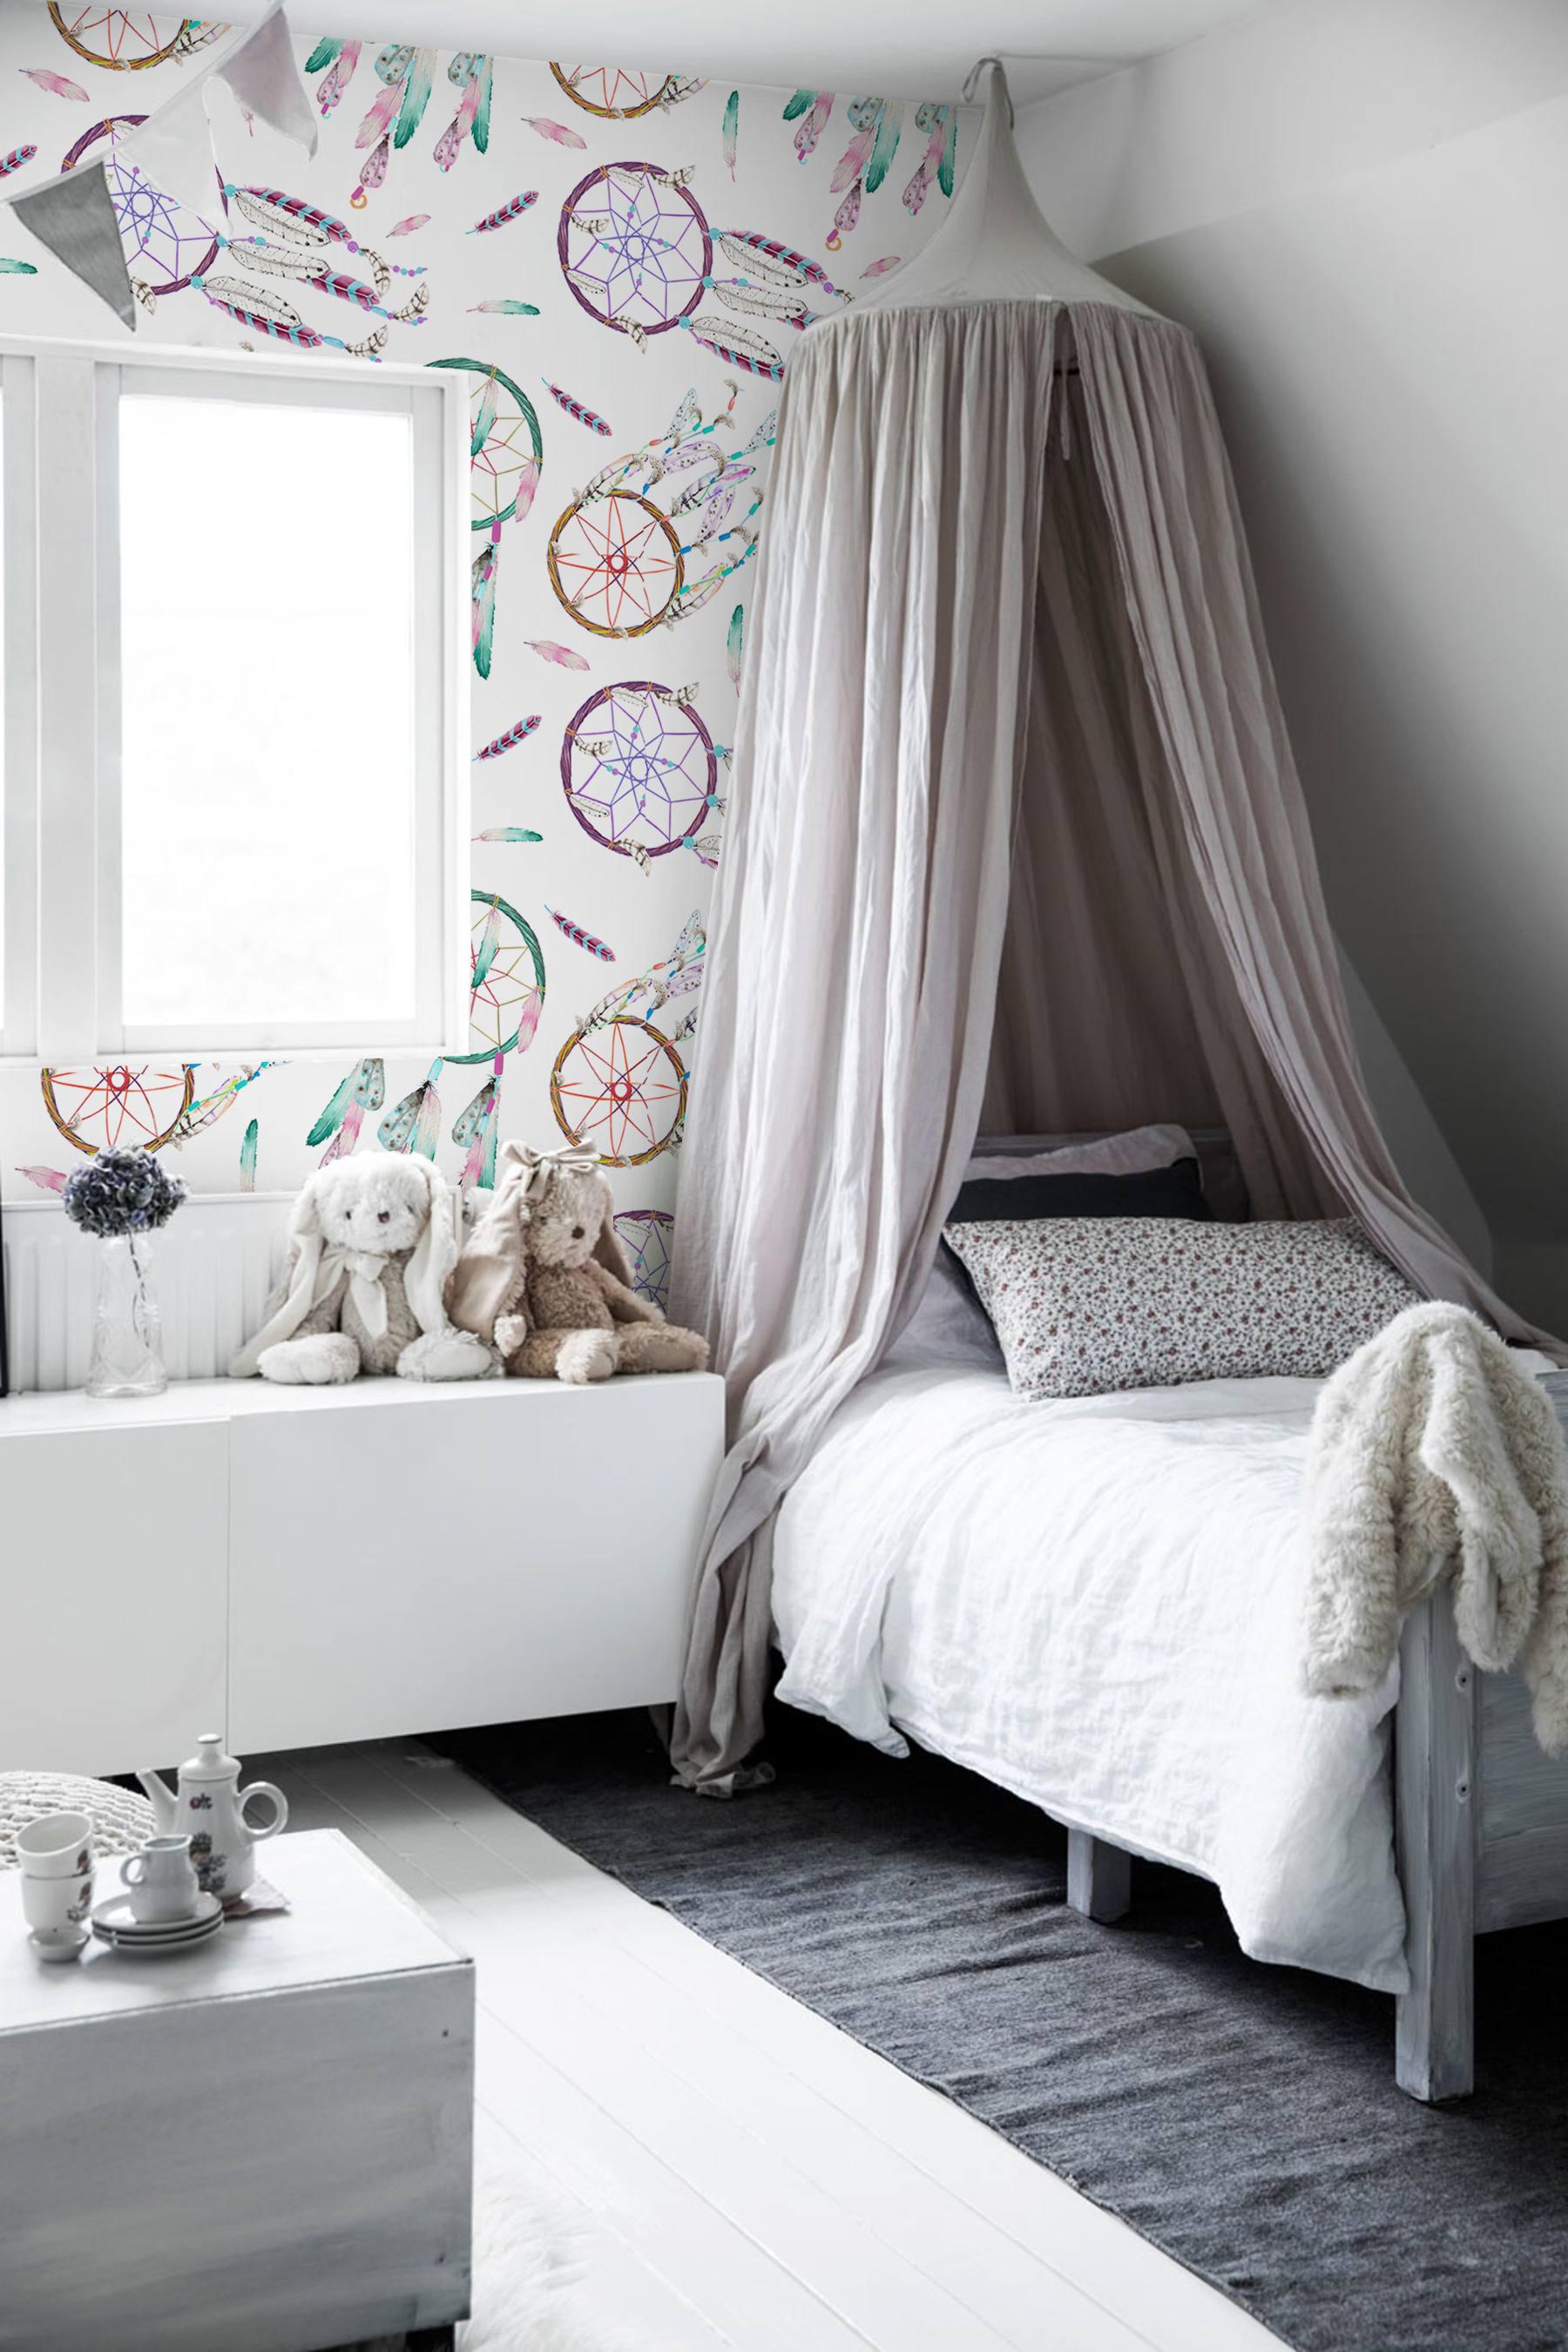 Best Dreamcatcher Wallpaper Coloraydecor Com 2 Day Shipping 400 x 300